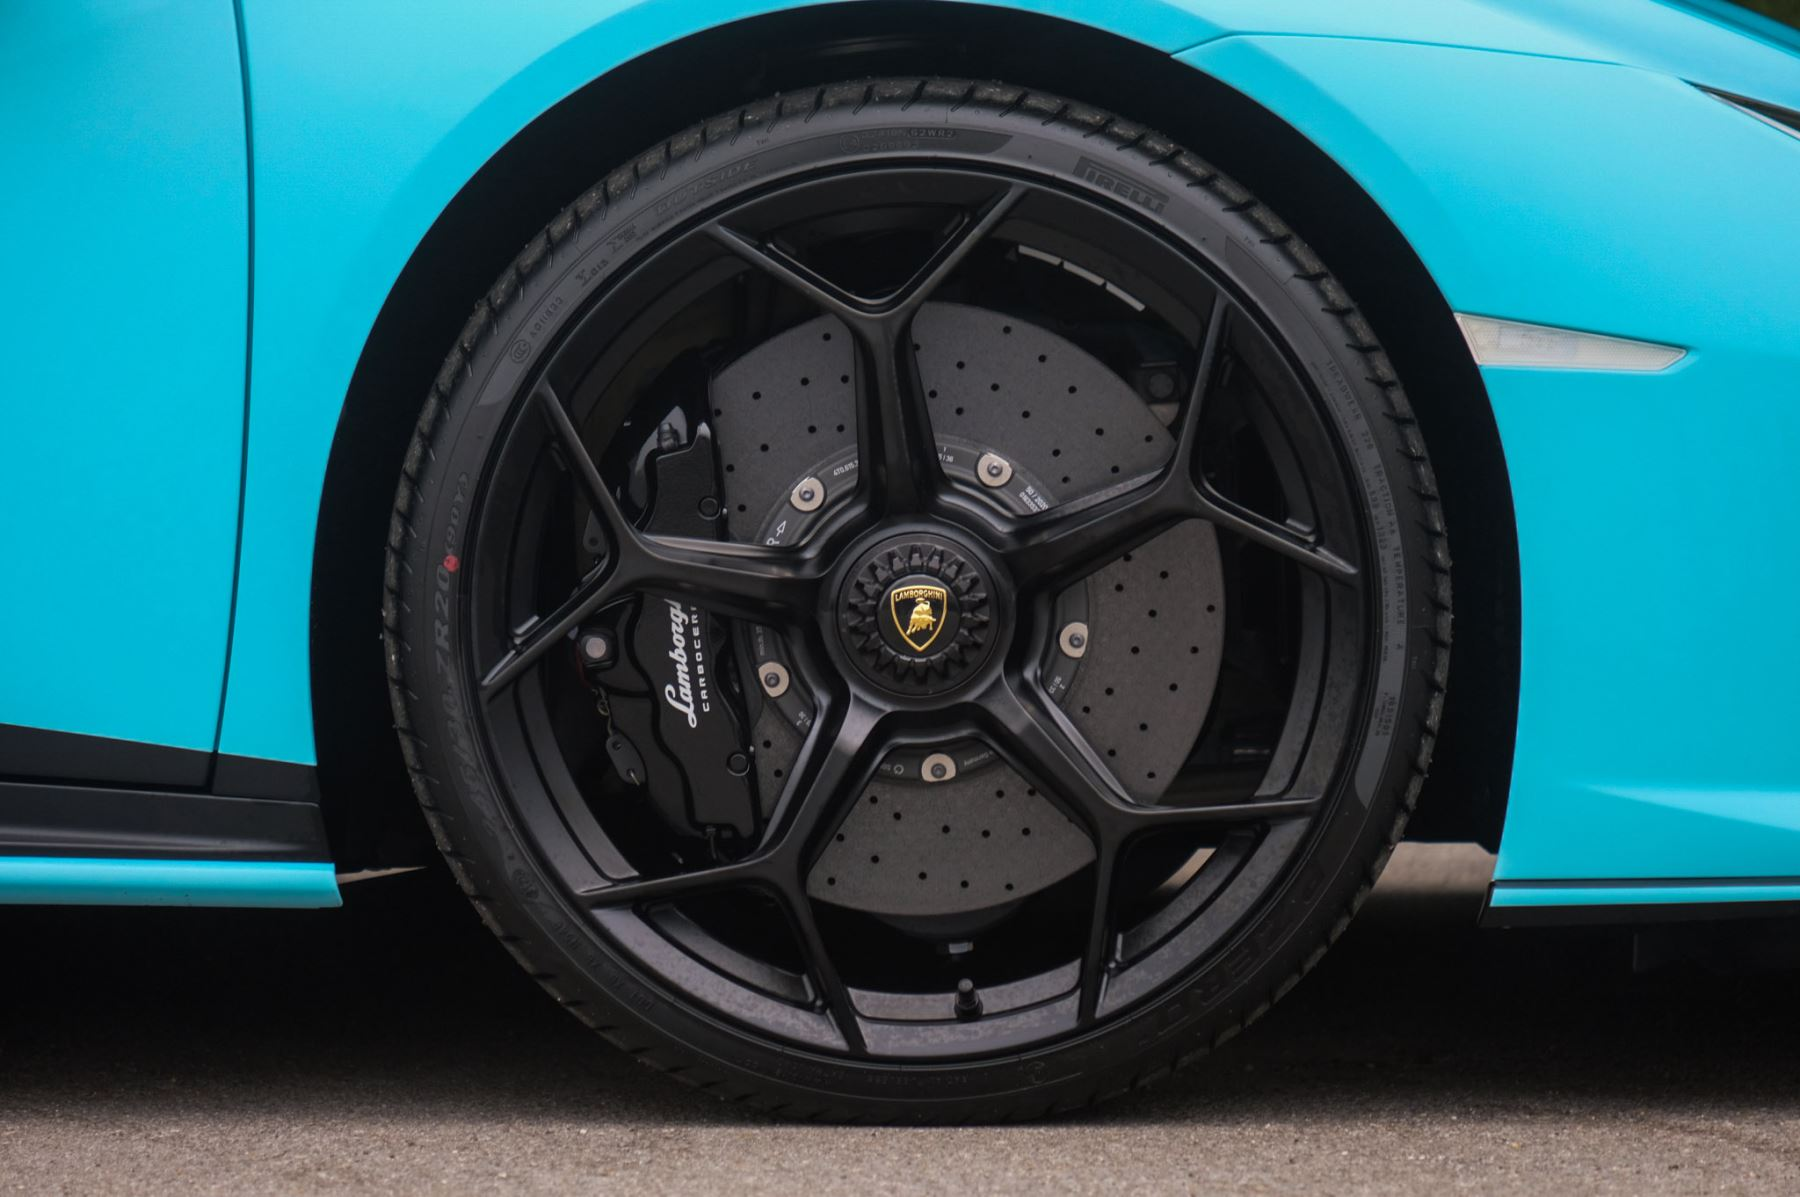 Lamborghini Huracan EVO Coupe image 9